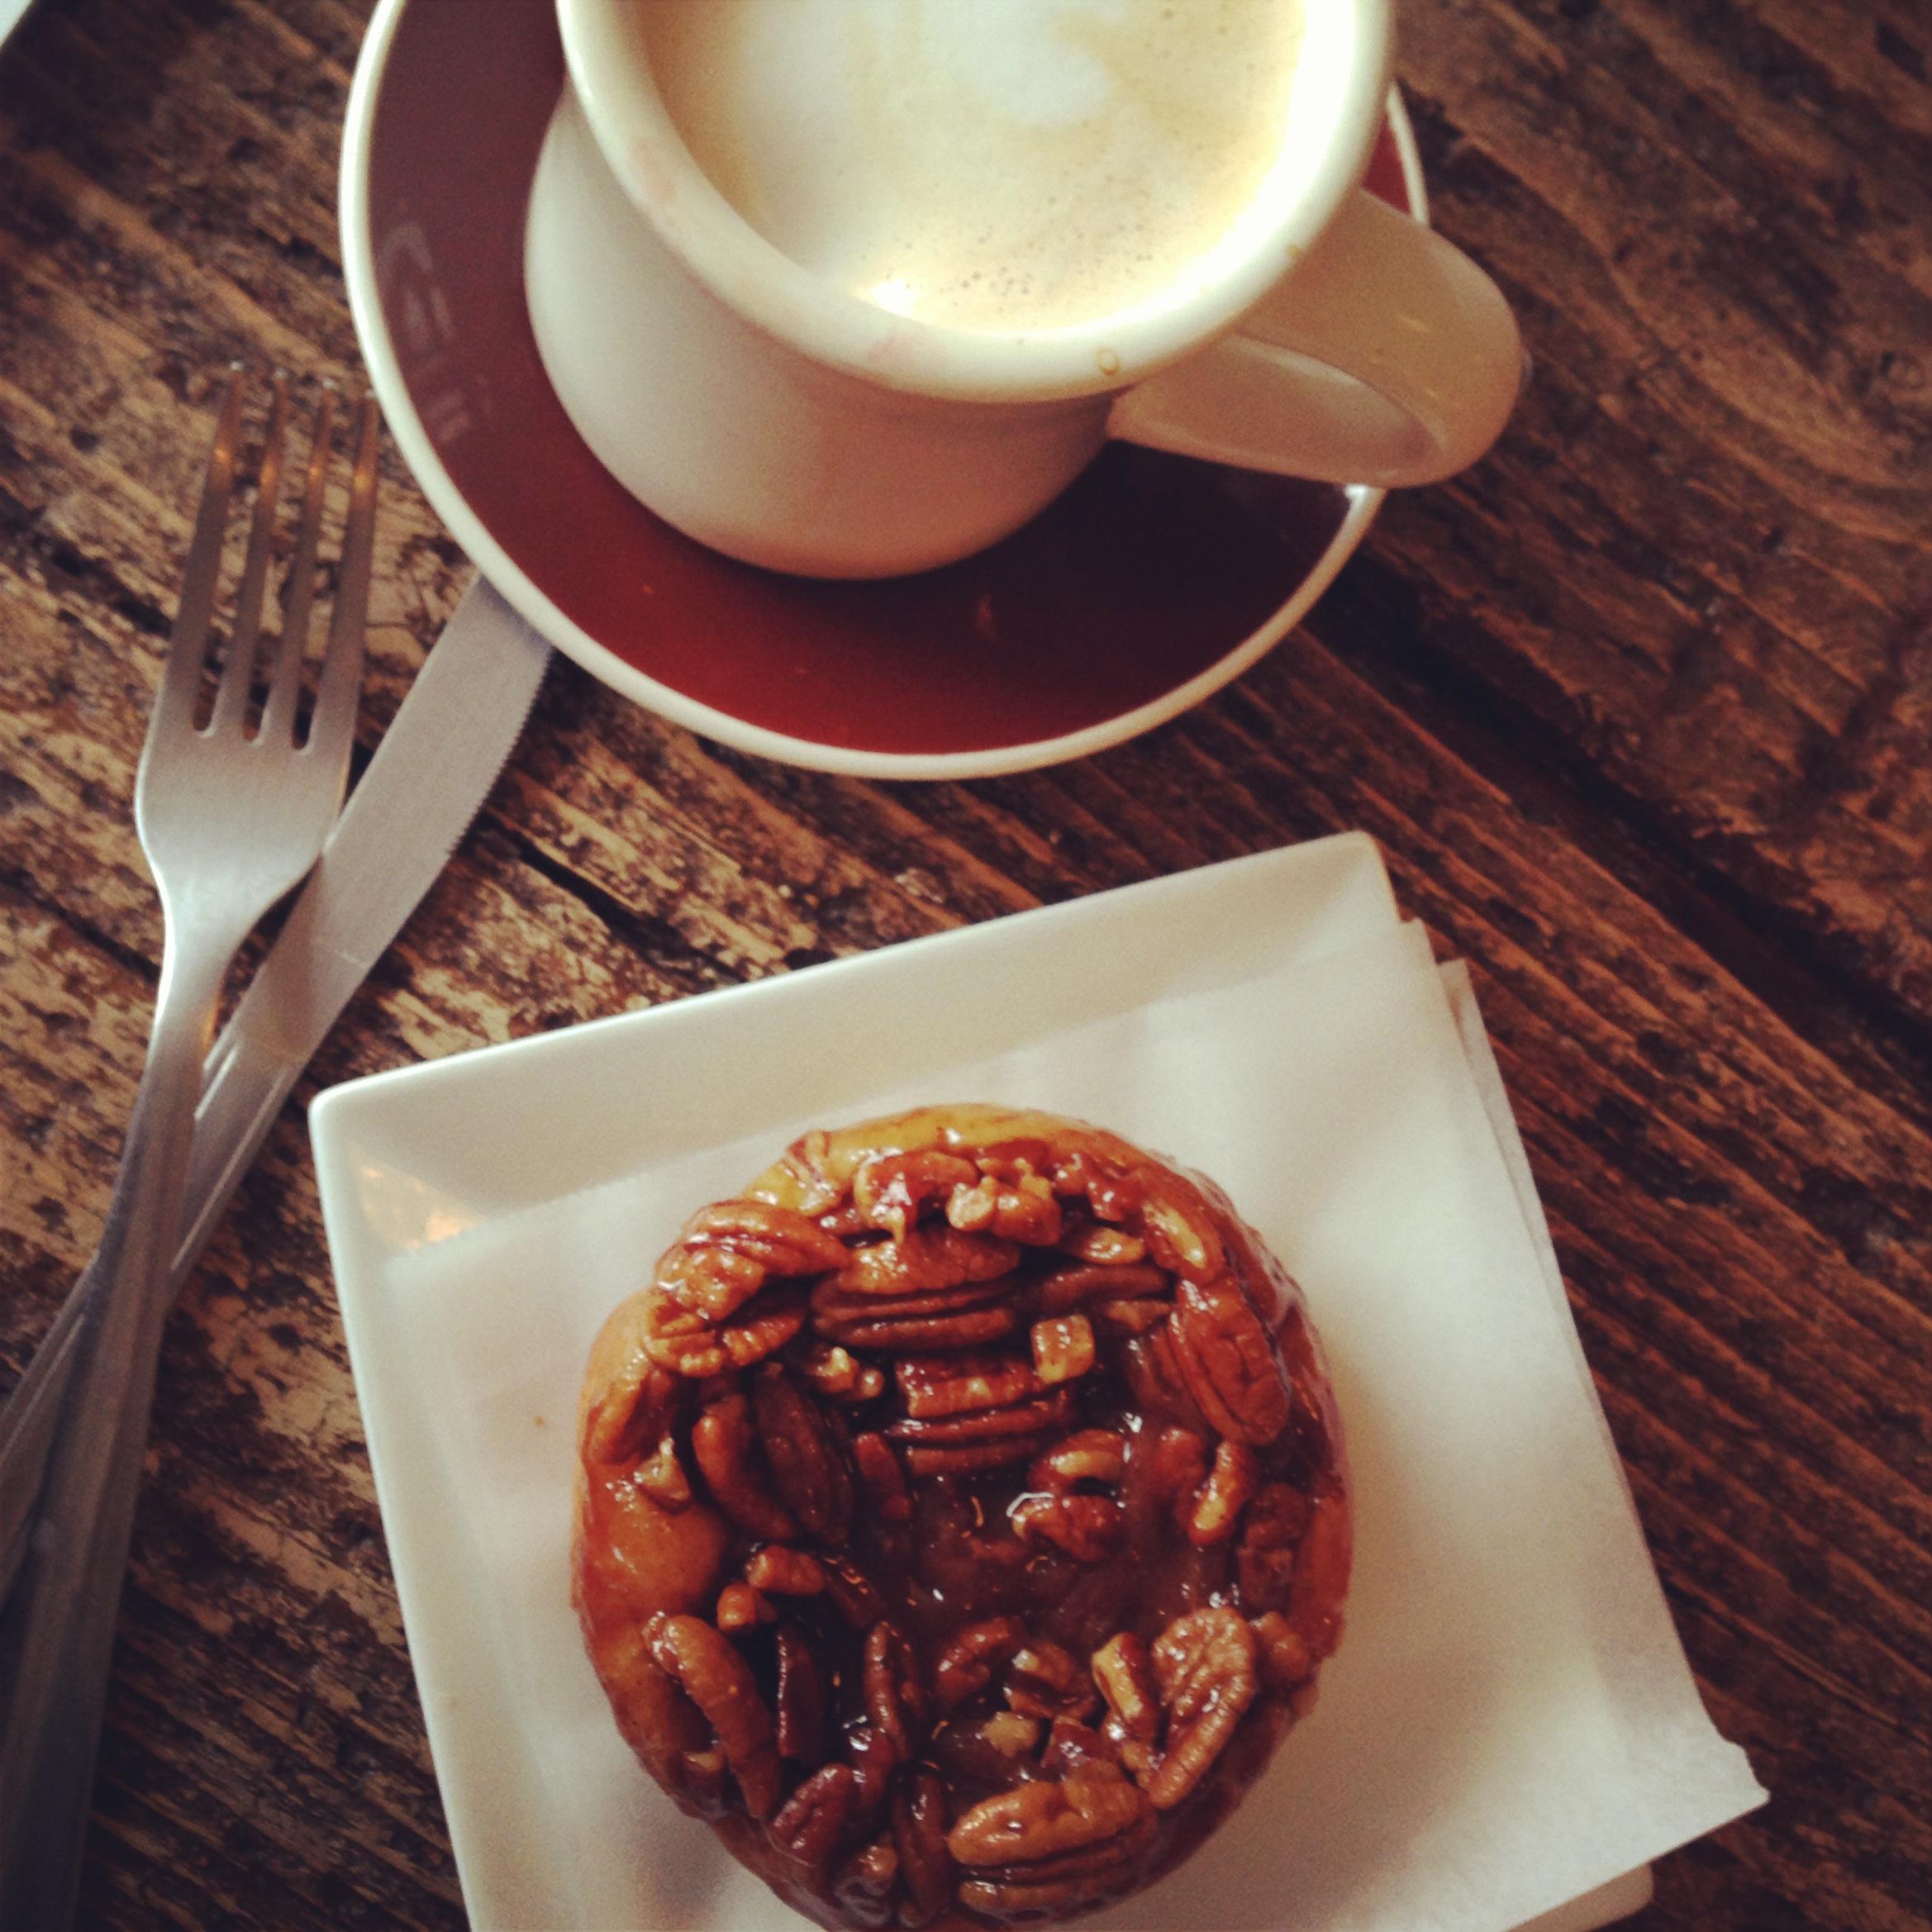 Coffee & Sticky Bun